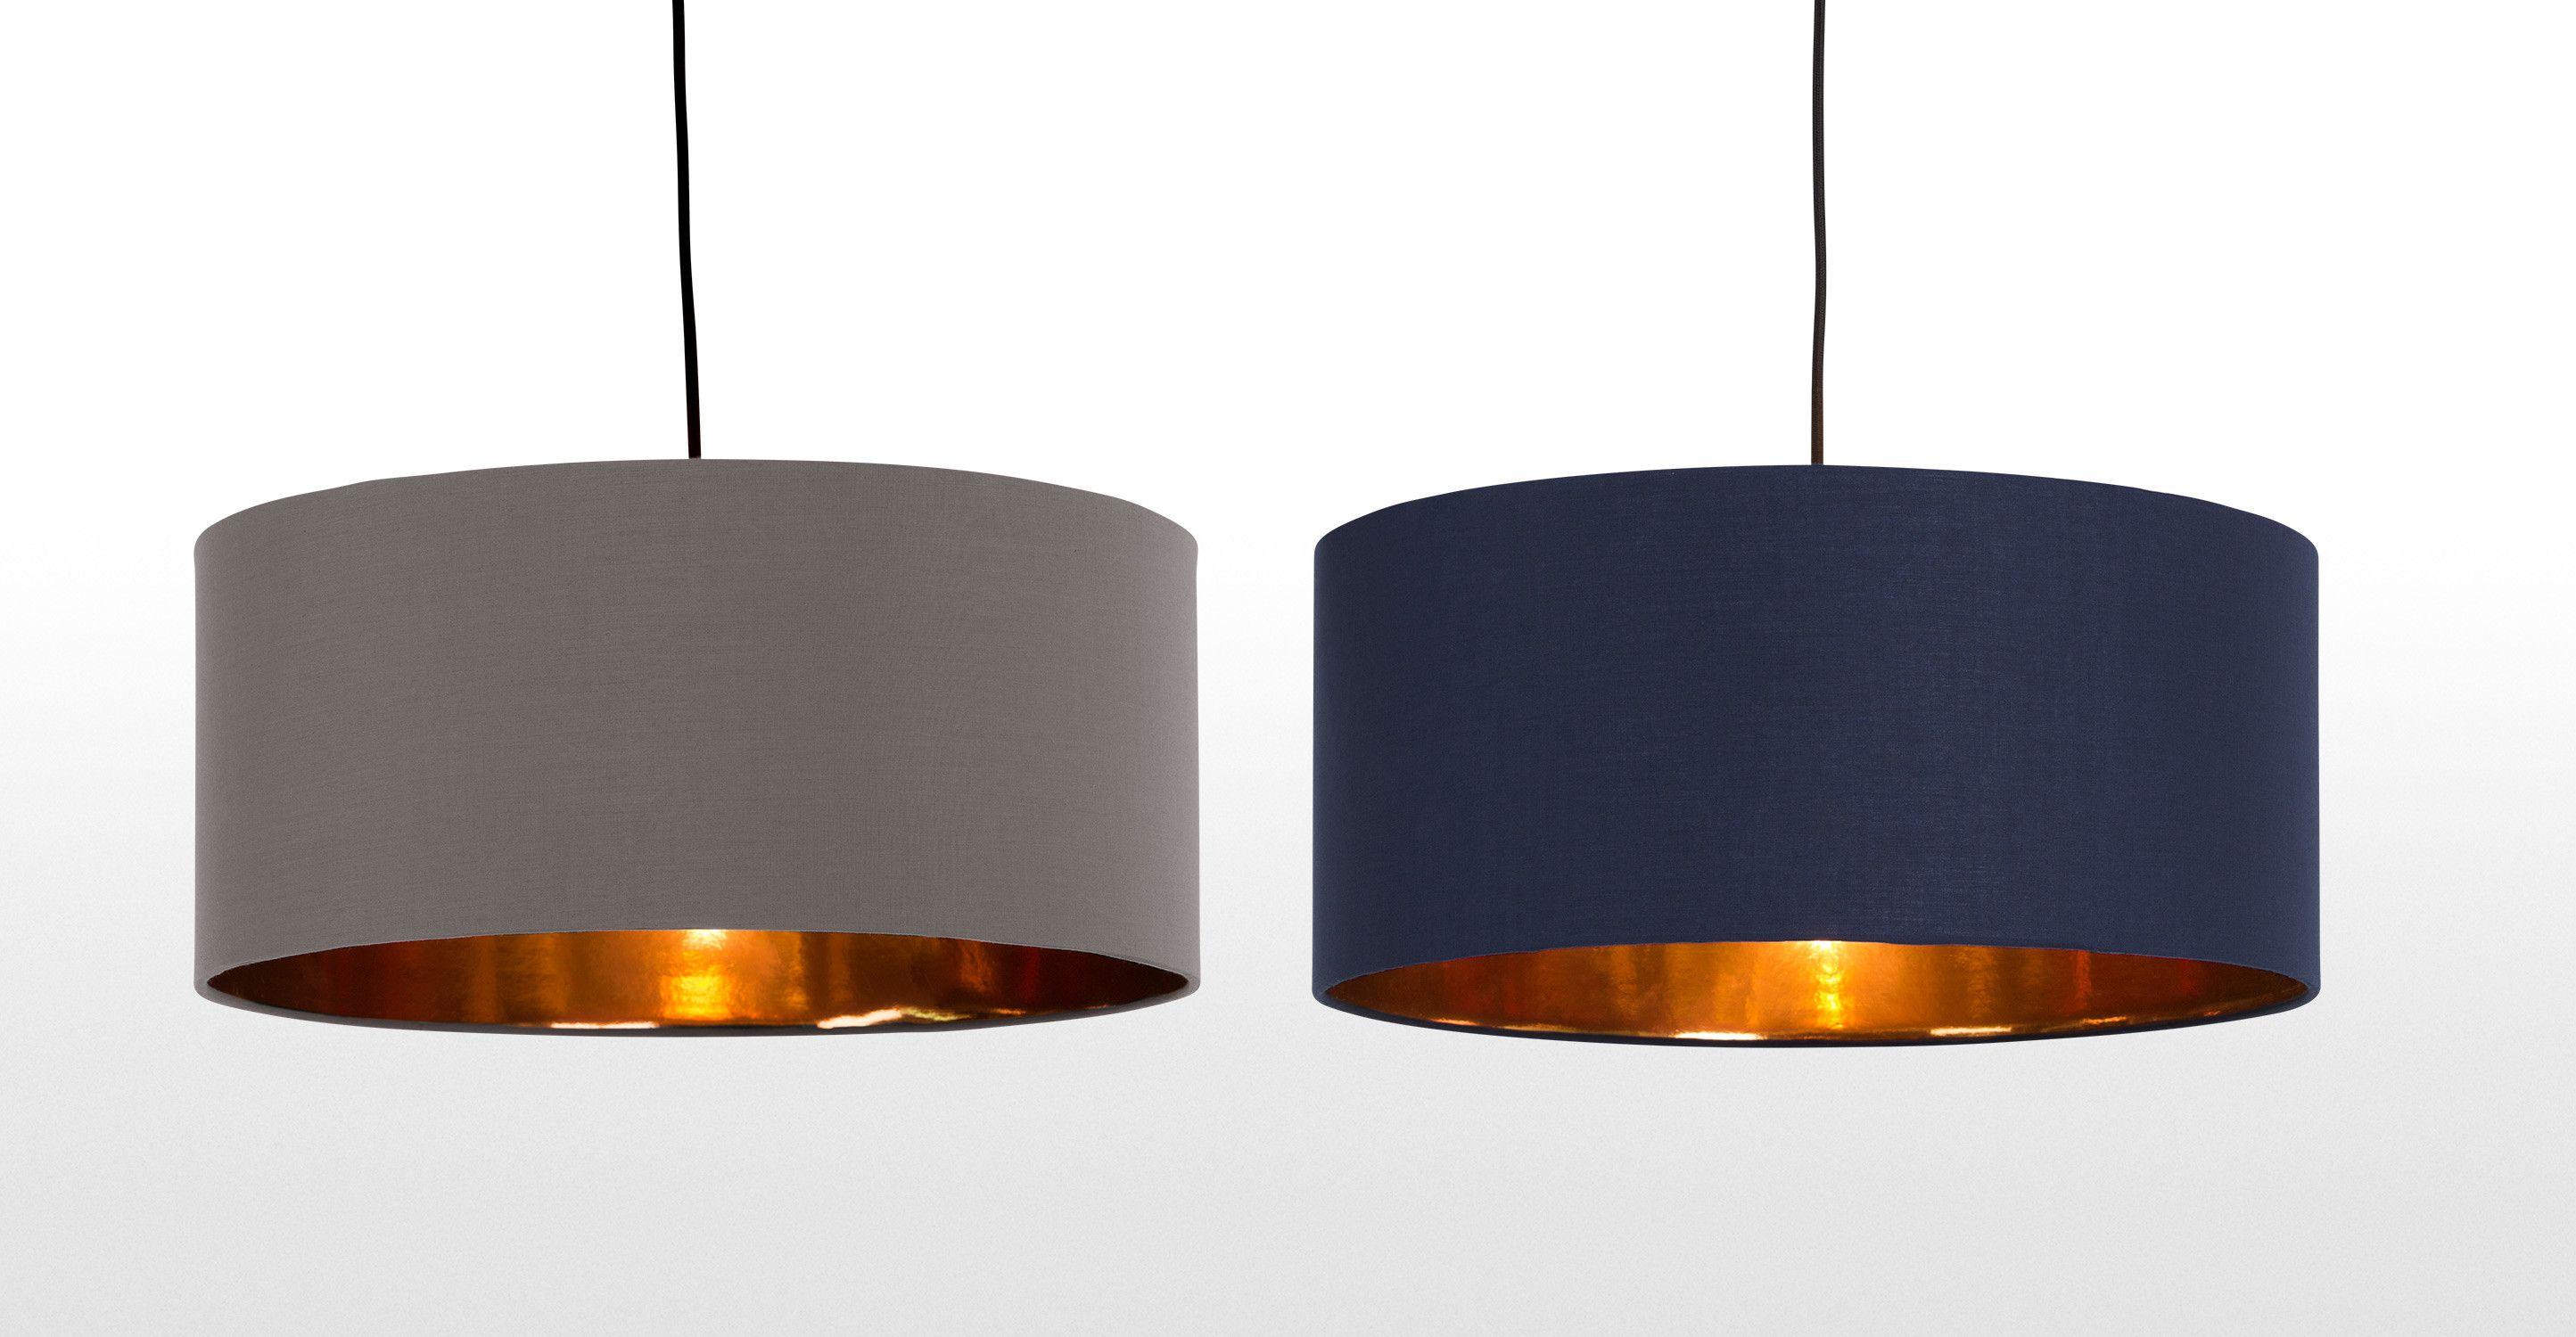 Grijze Slaapkamer Lamp : Hue hanglampenkap grijs & koper made.com home decoration